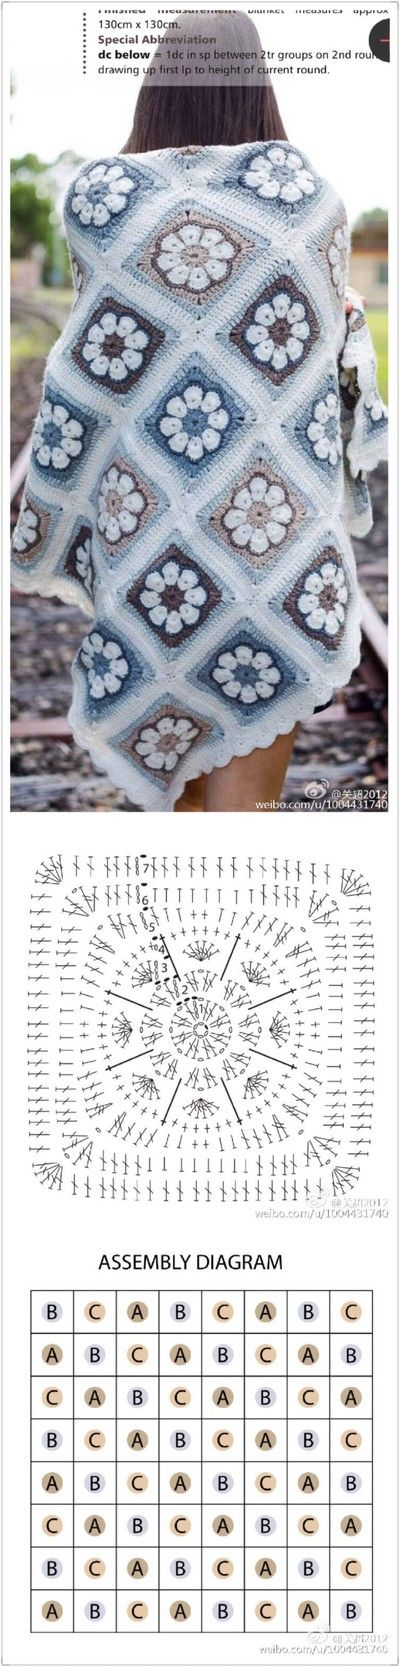 Crochet Granny square, 8-petal African Flower.